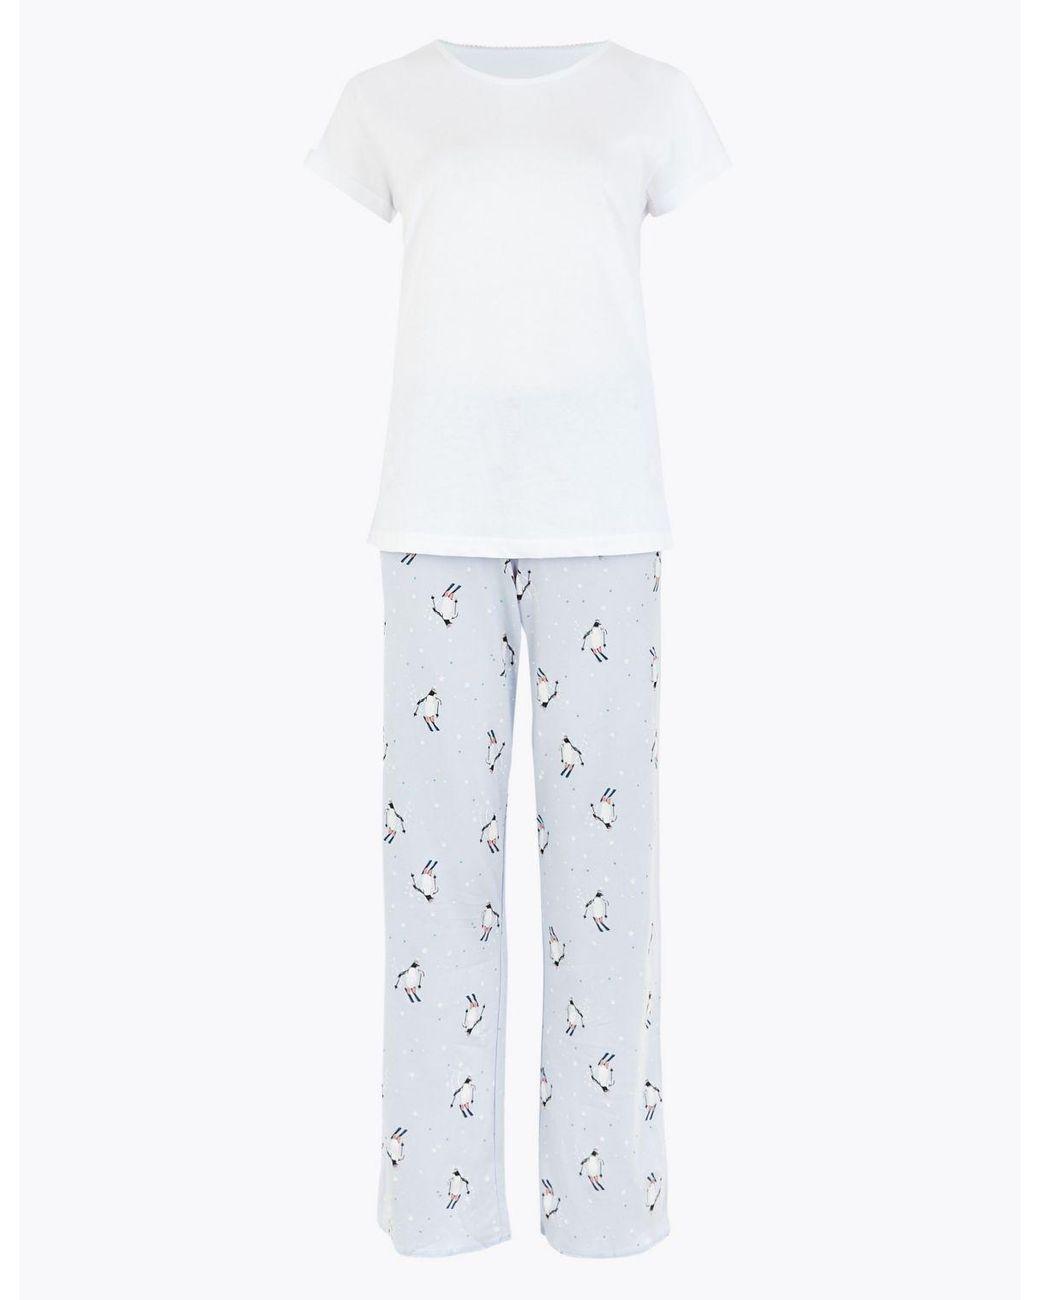 M/&S Ladies Womens Pyjama pj/'s set Navy Green Check Nightwear Night Shirt Penguin